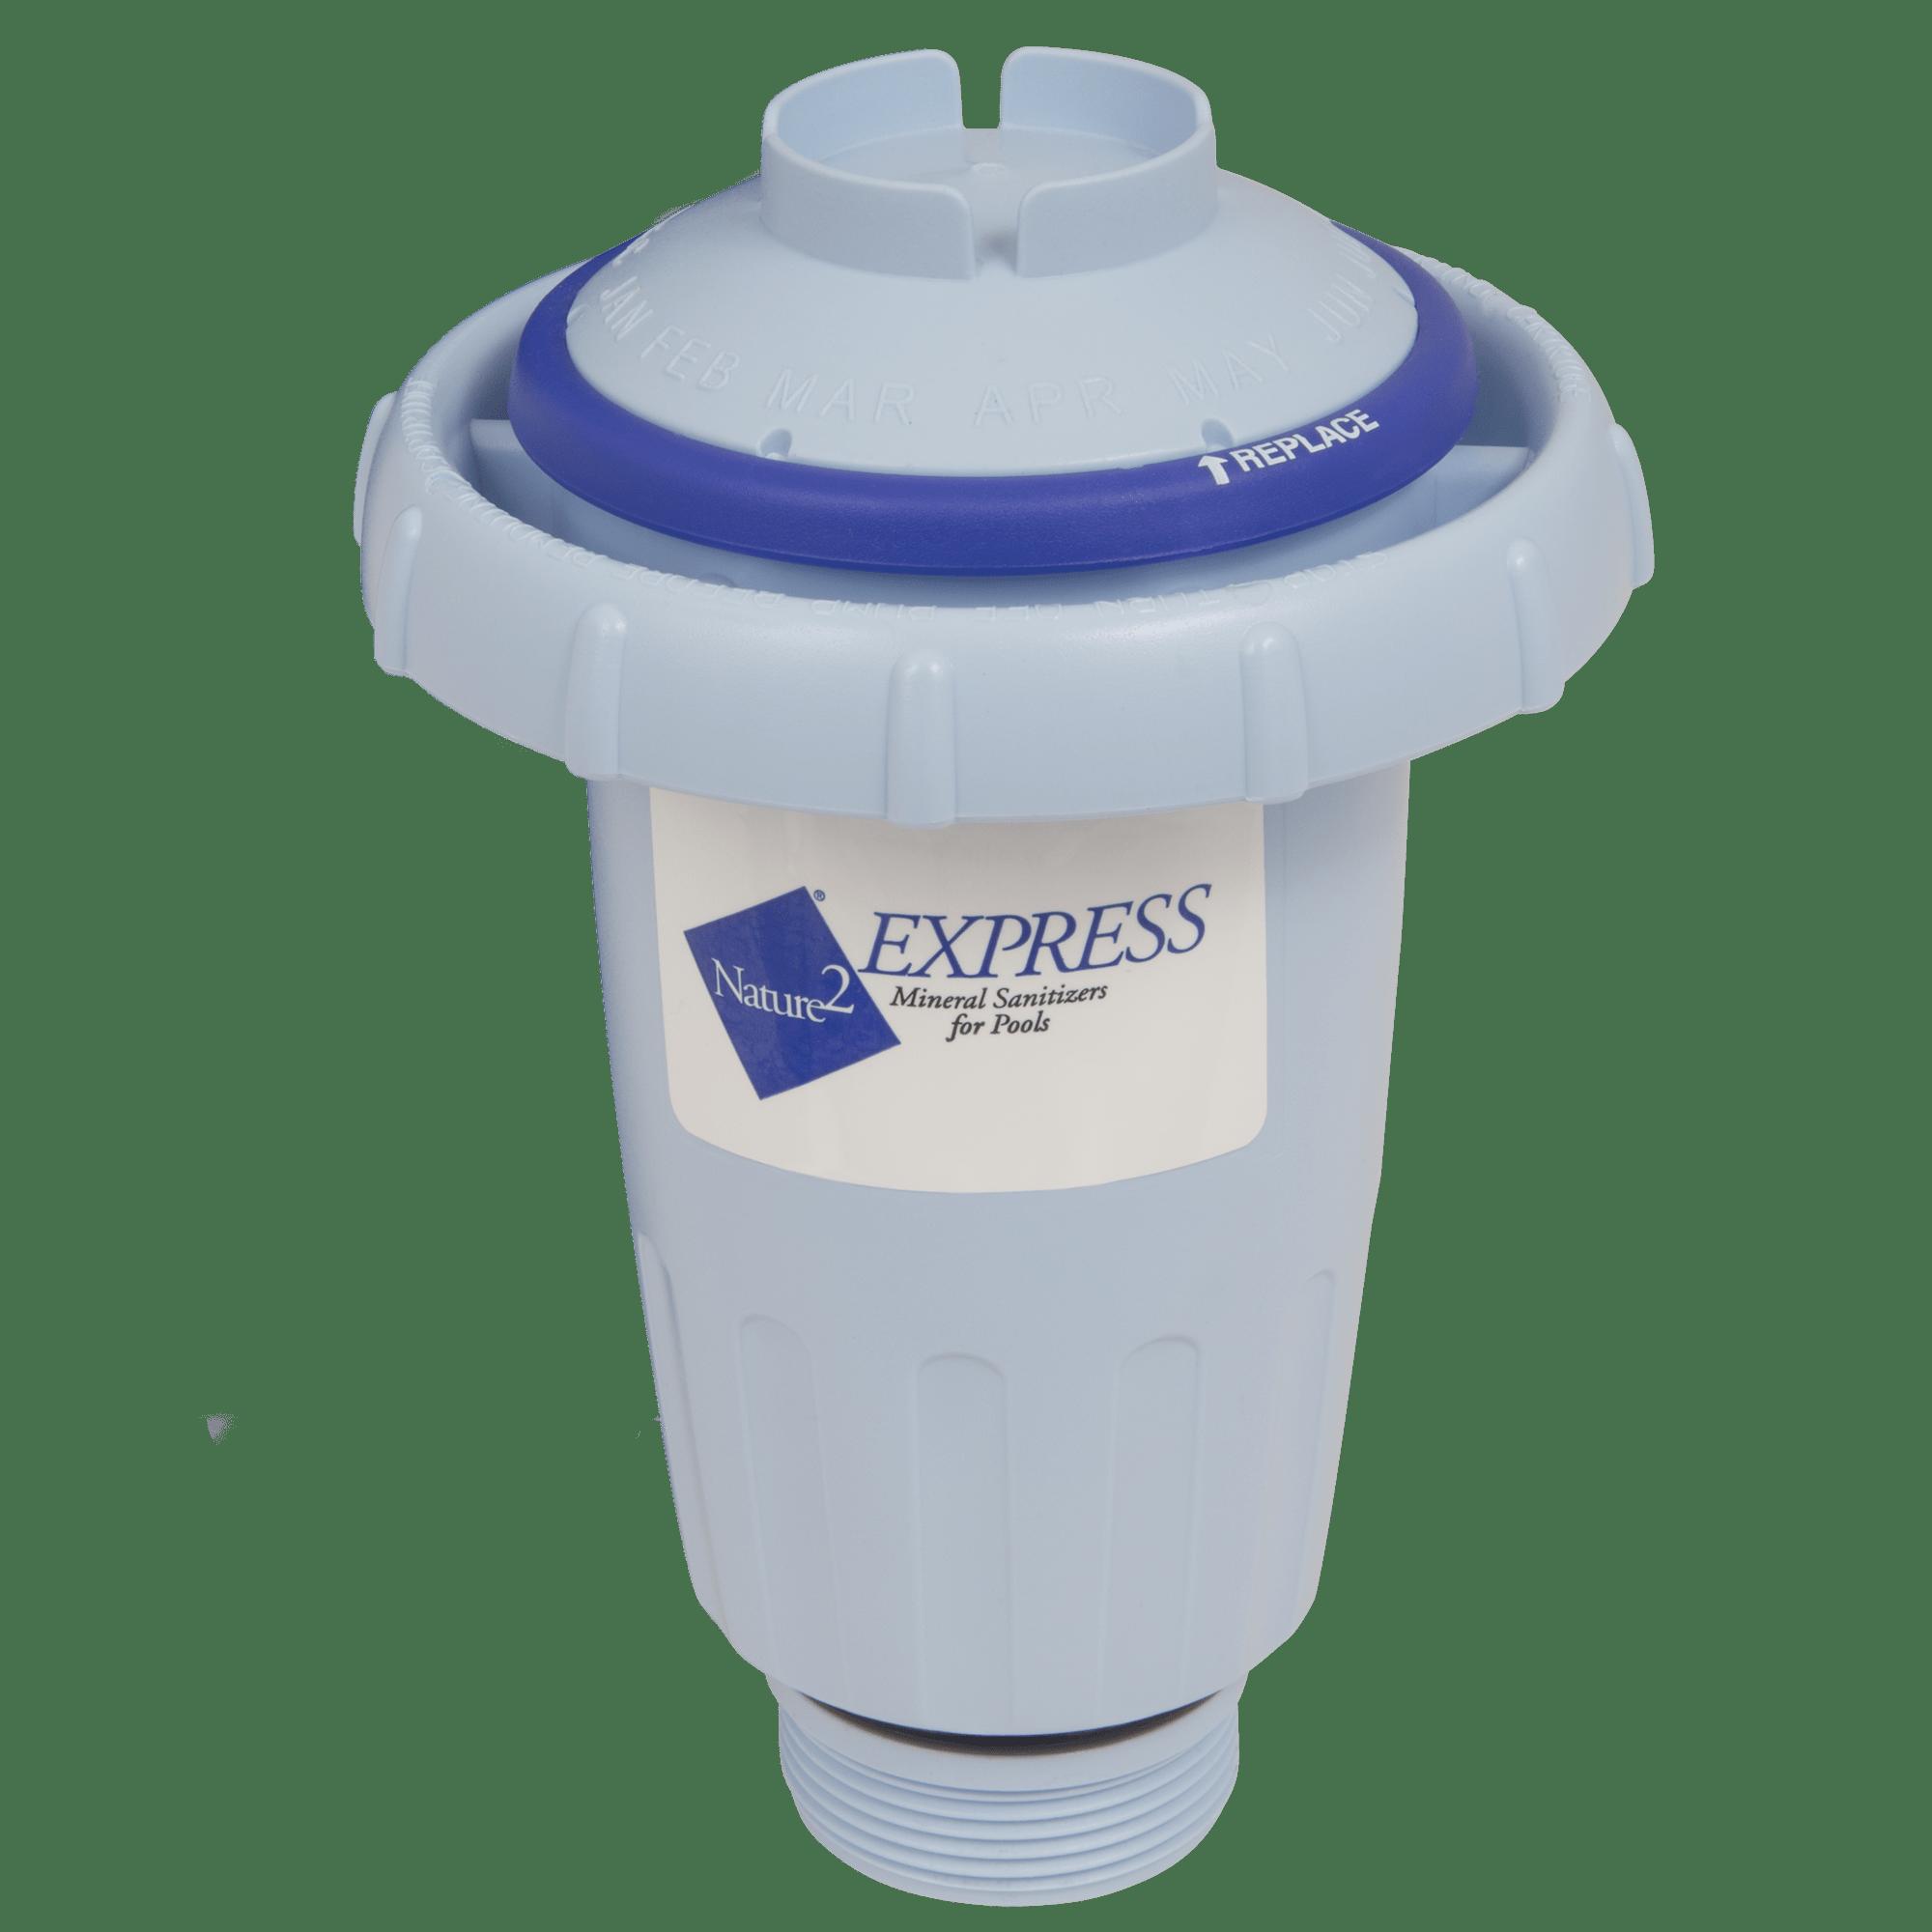 Nature2 Express Mineral Sanitizer